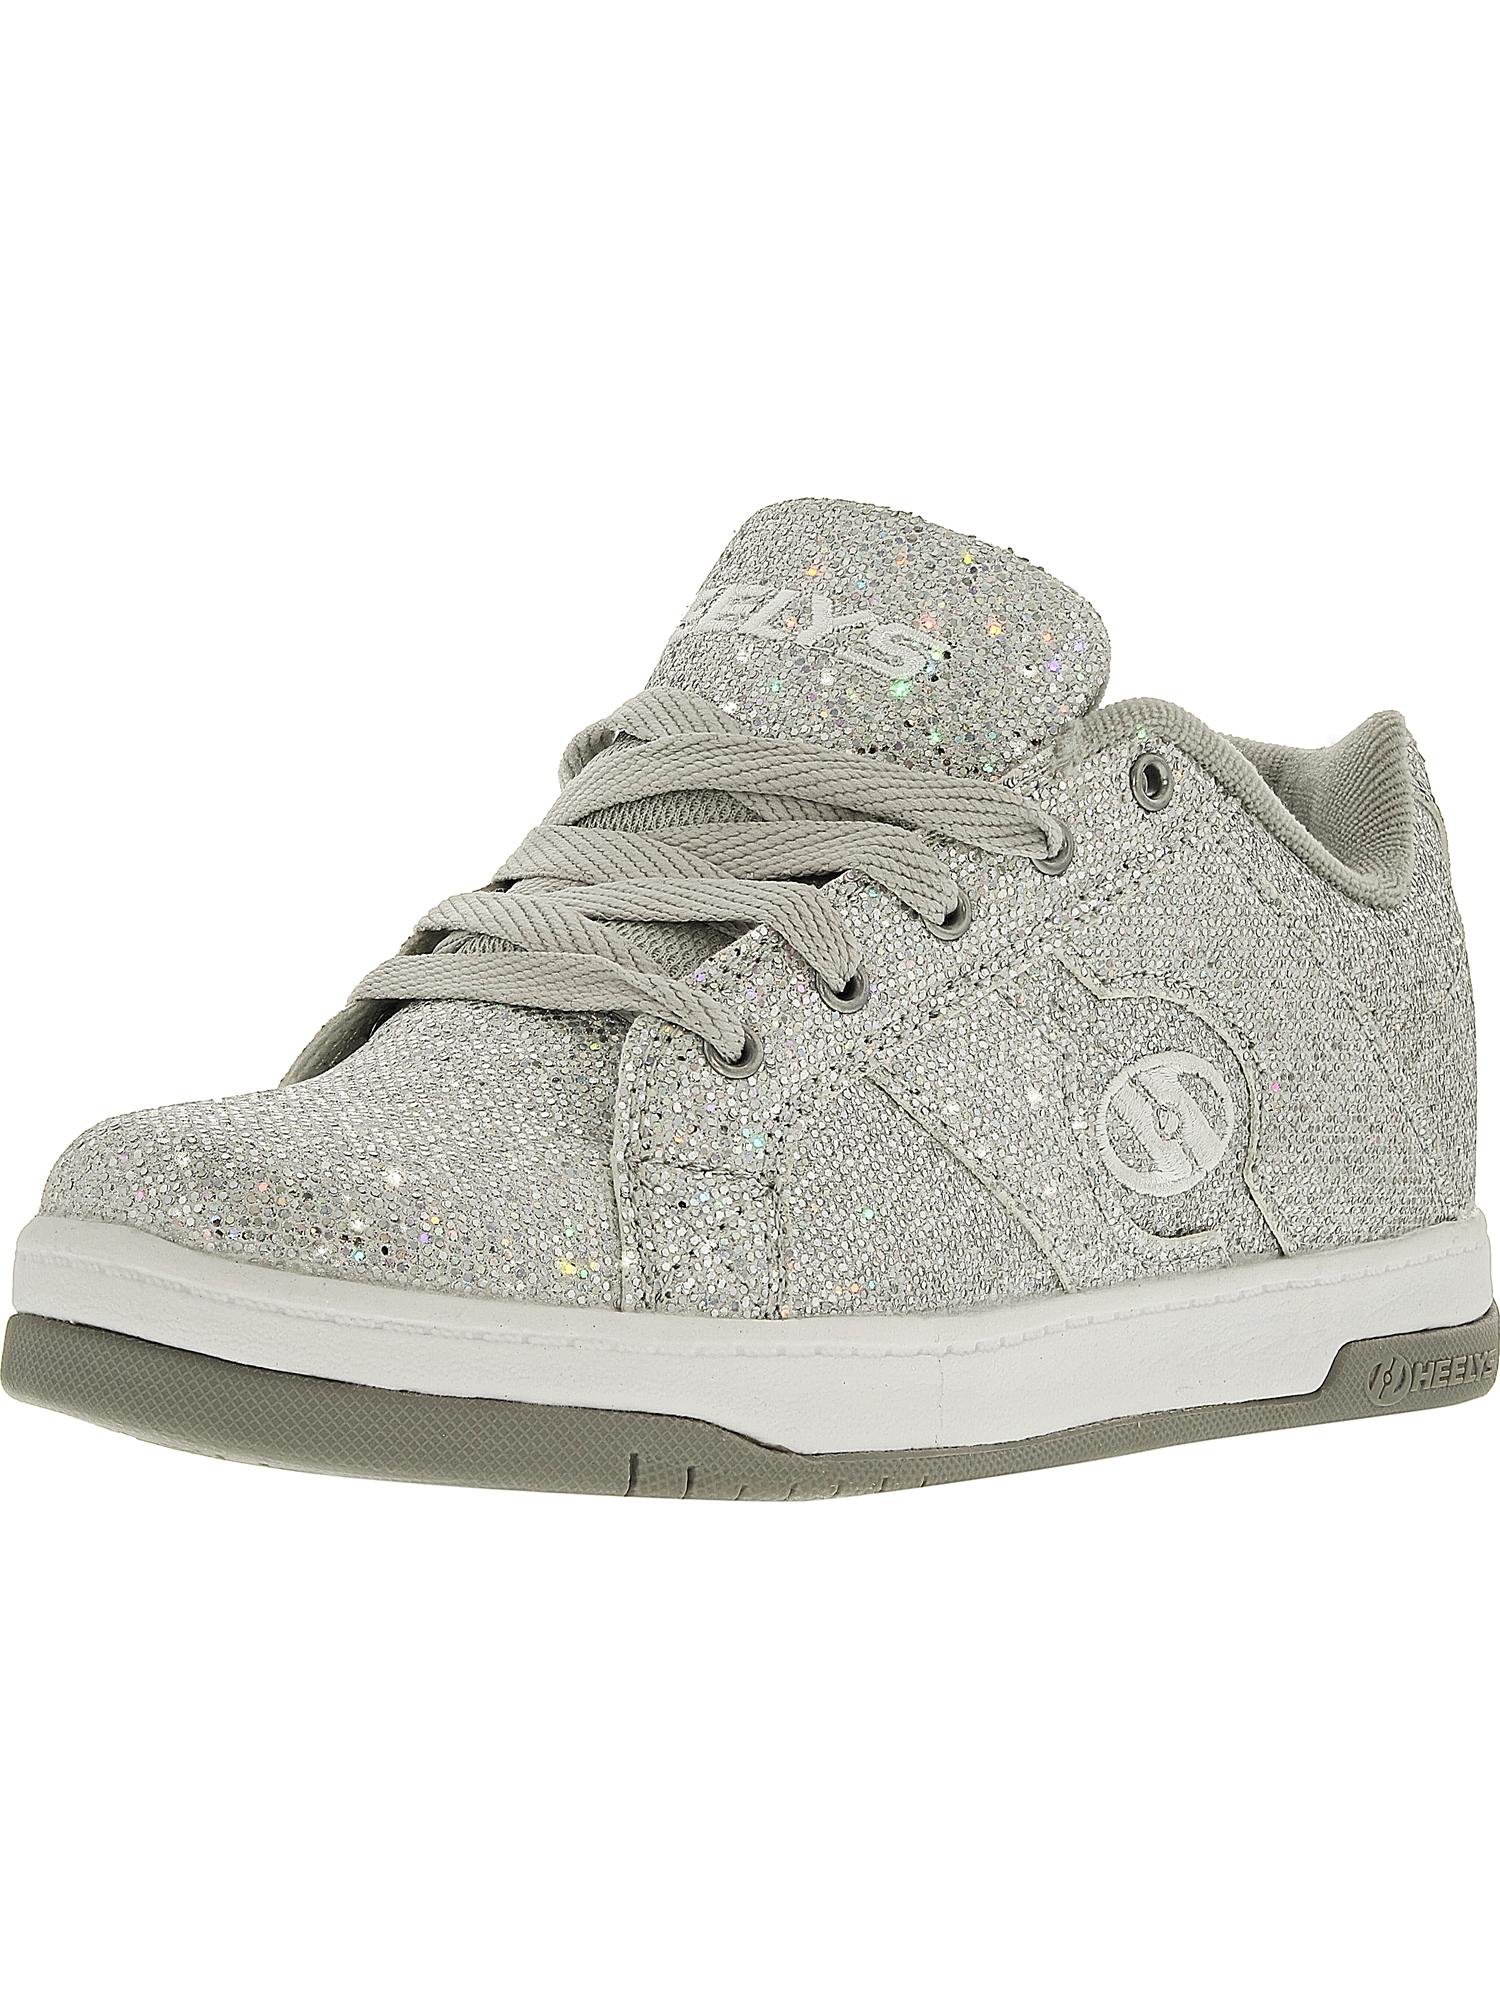 Heelys Split Silver Disco Glitter Ankle-High Fashion Sneaker - 5M